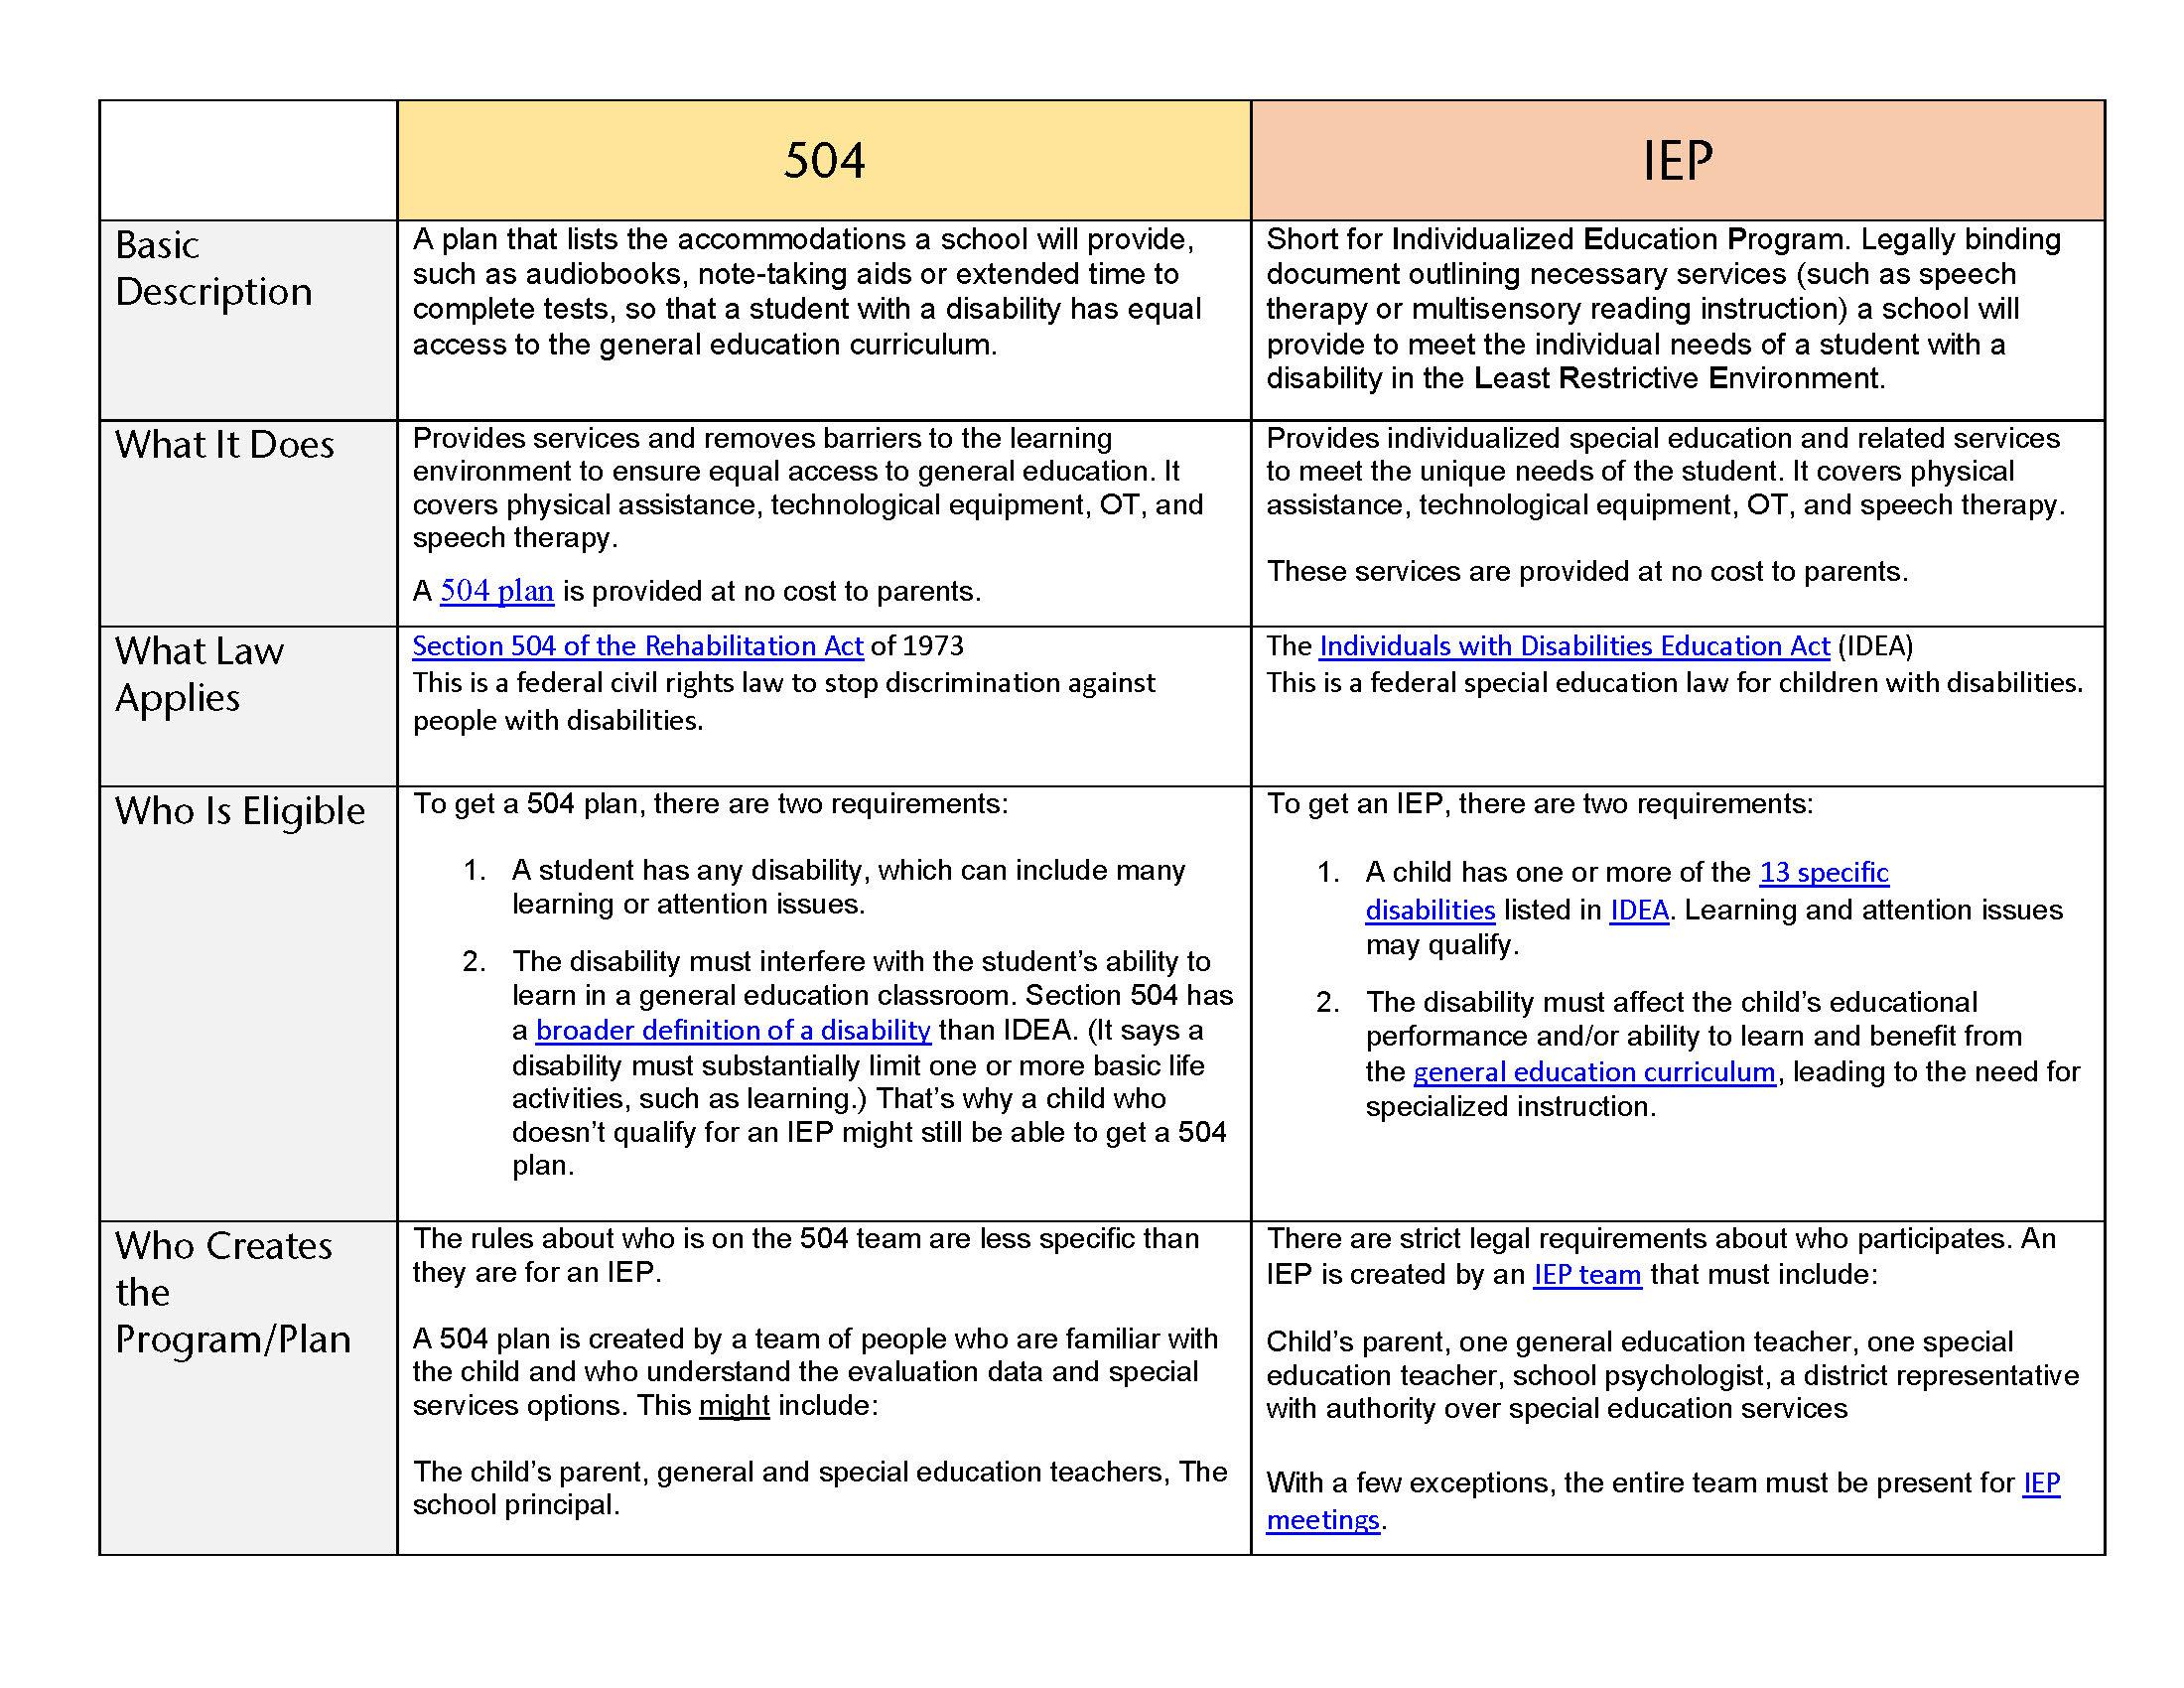 IEP vs 504, Accomodations vs modification charts